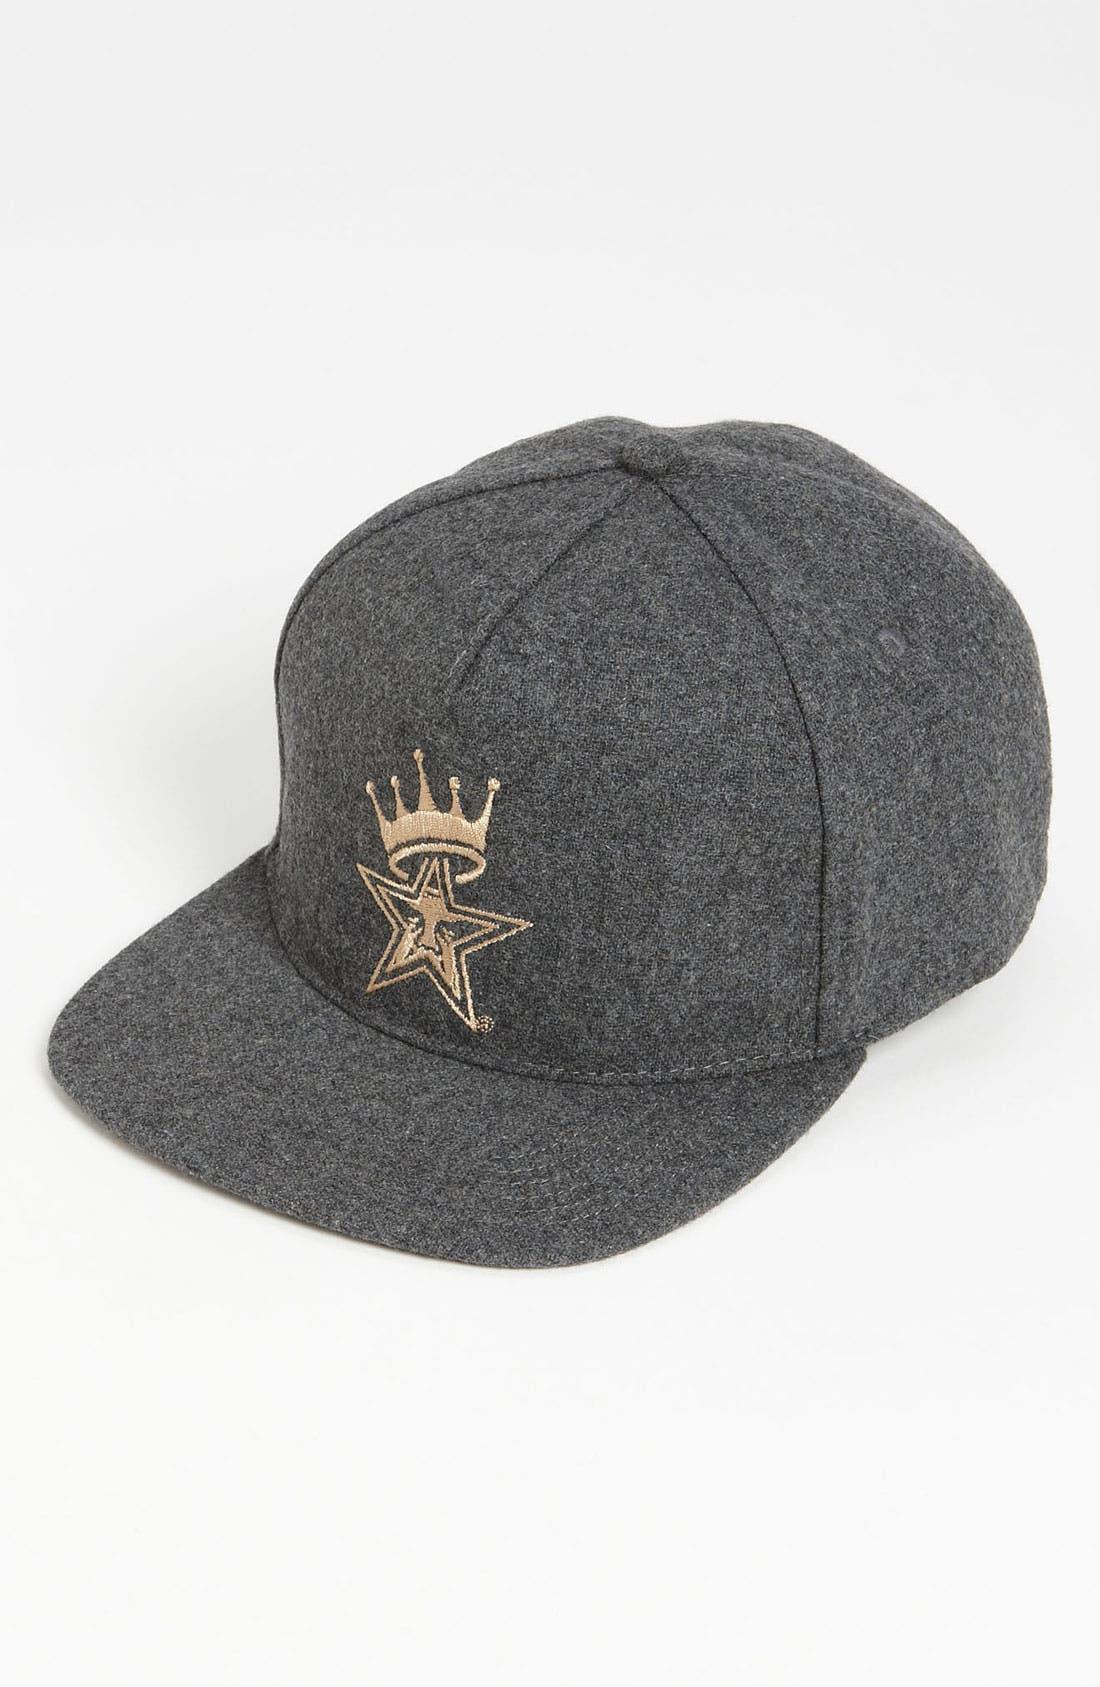 Main Image - Obey 'Crowned' Snapback Baseball Cap